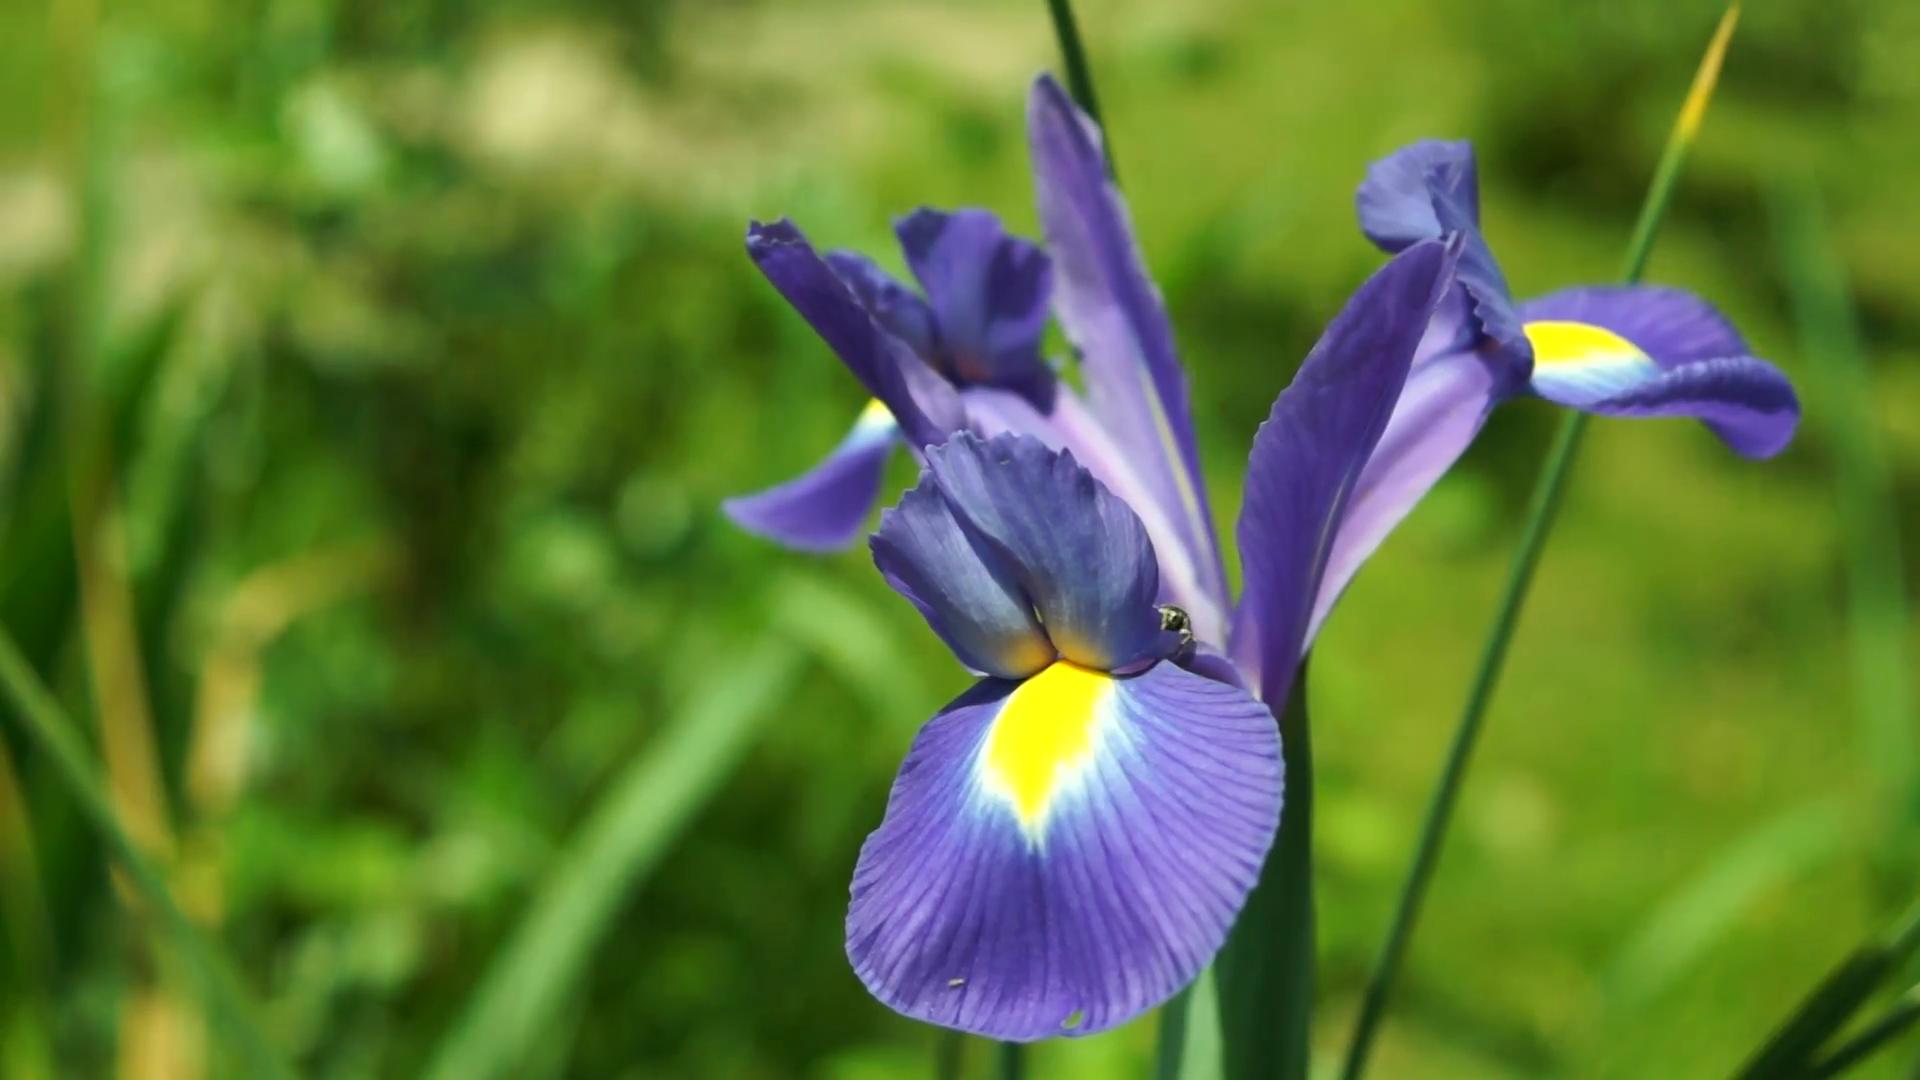 Free Photo Blue Iris Flower Outdoors Nature Natural Free